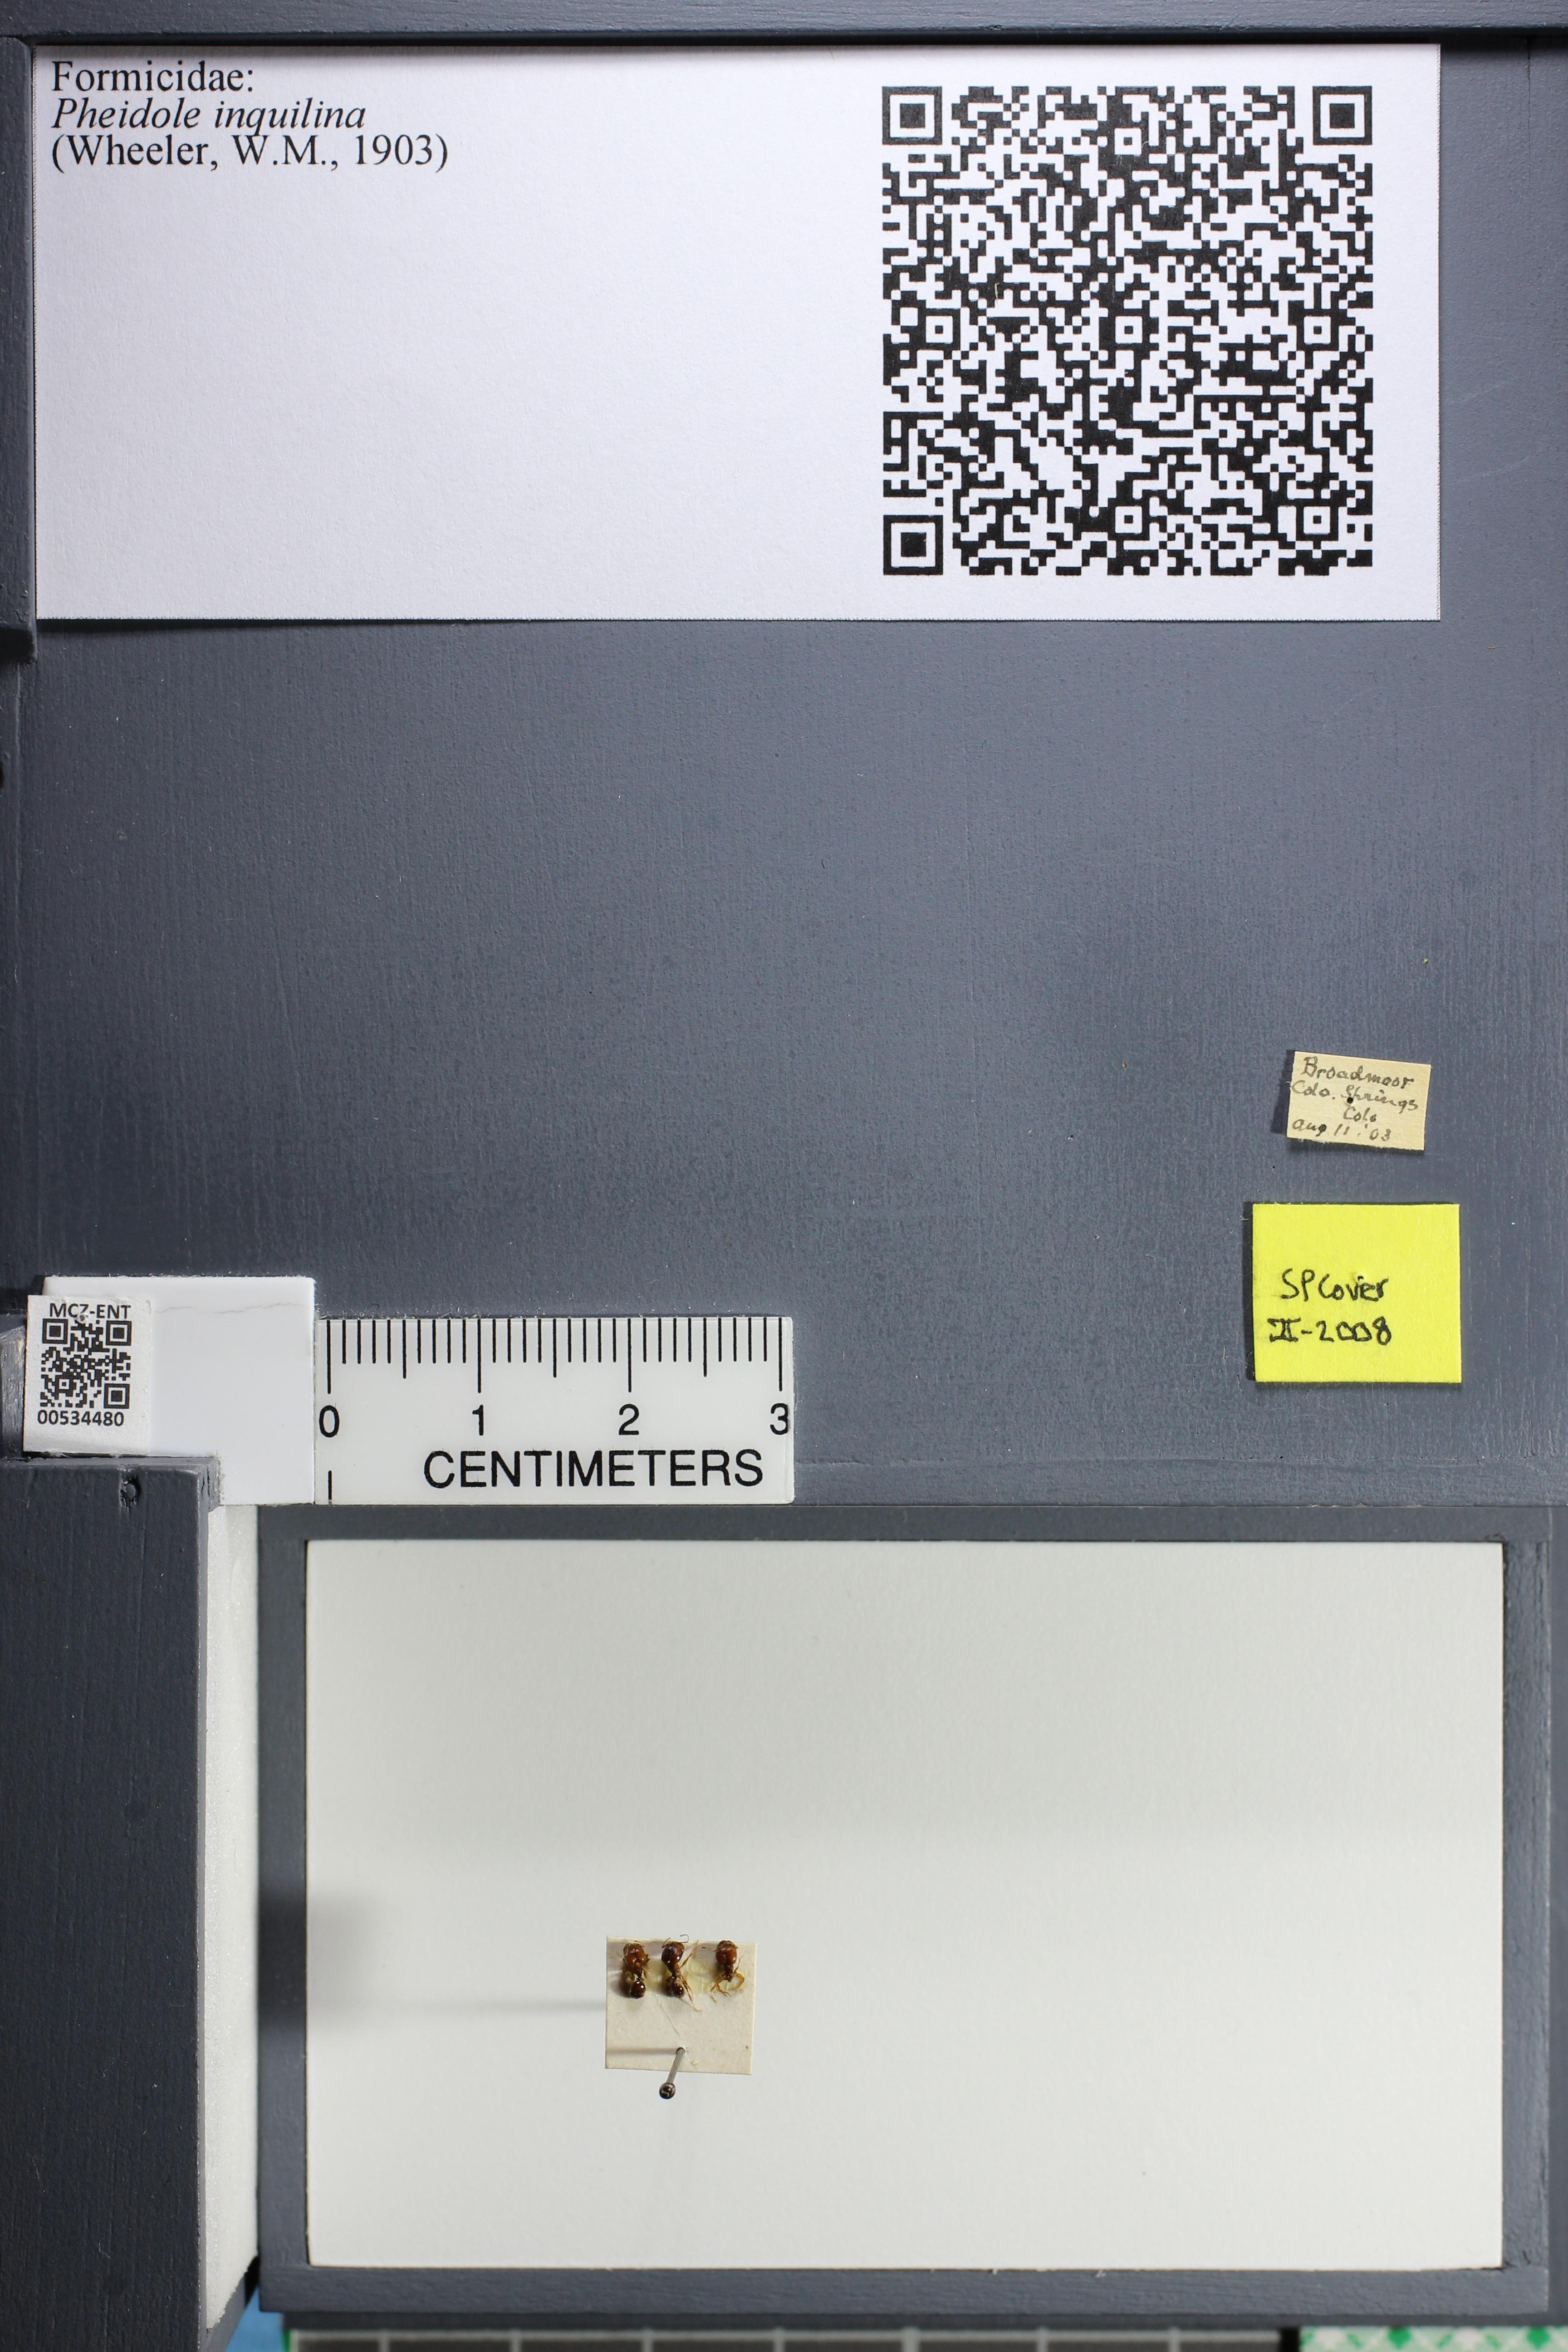 Media of type image, MCZ:Ent:534480 Identified as Pheidole pilifera.